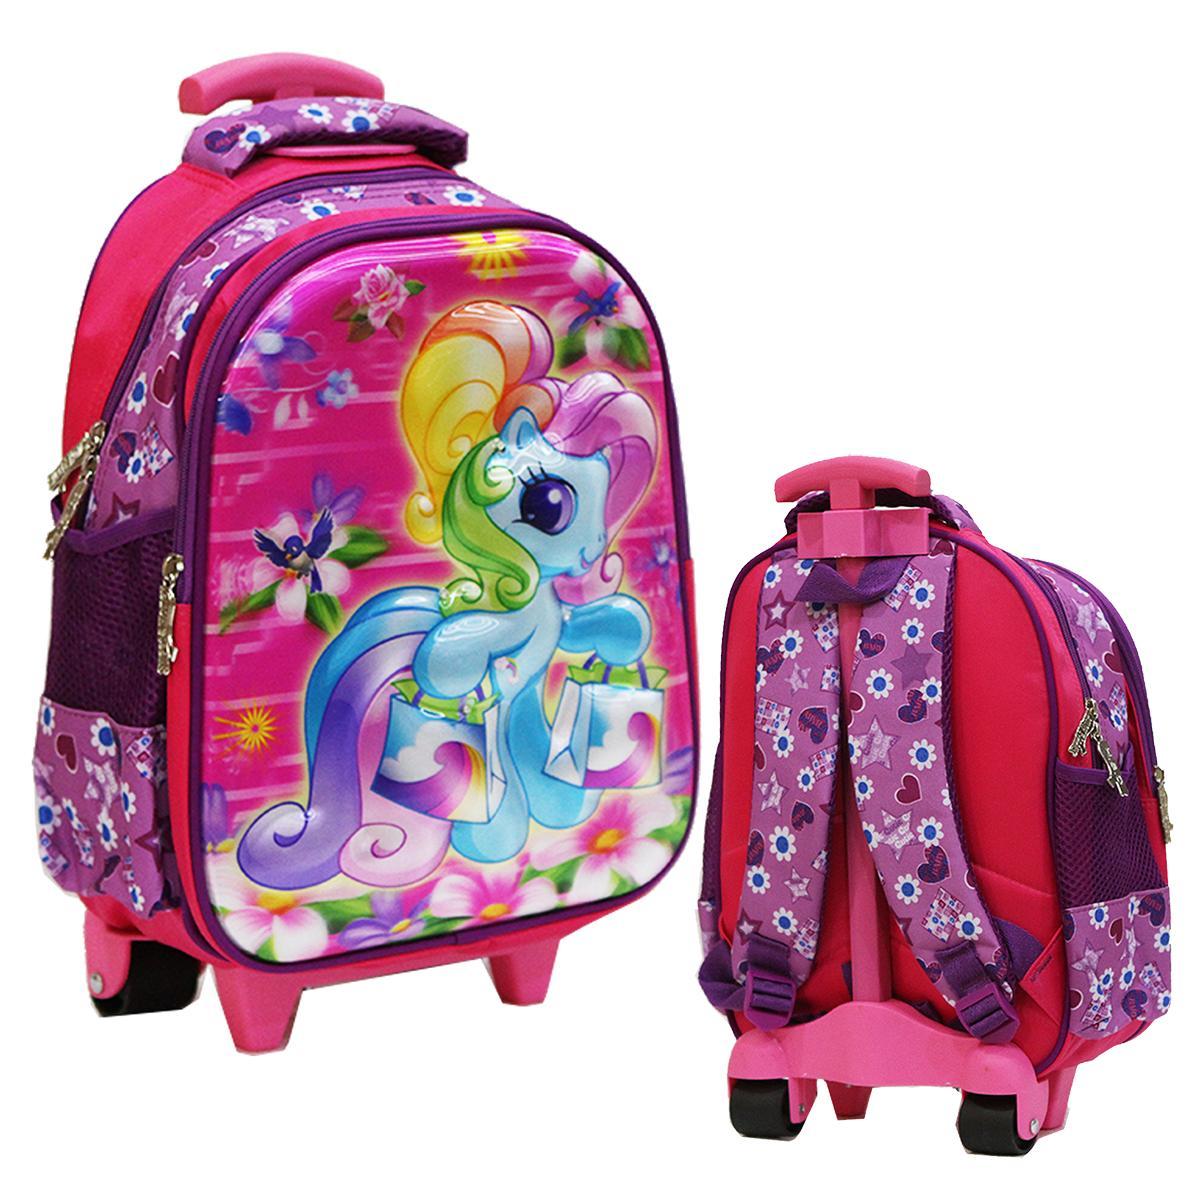 Cek Harga Baru Onlan Tas Trolley Anak Sekolah Tk My Little Pony Cantik 5d Timbul Import Pink Terkini Maret 2019